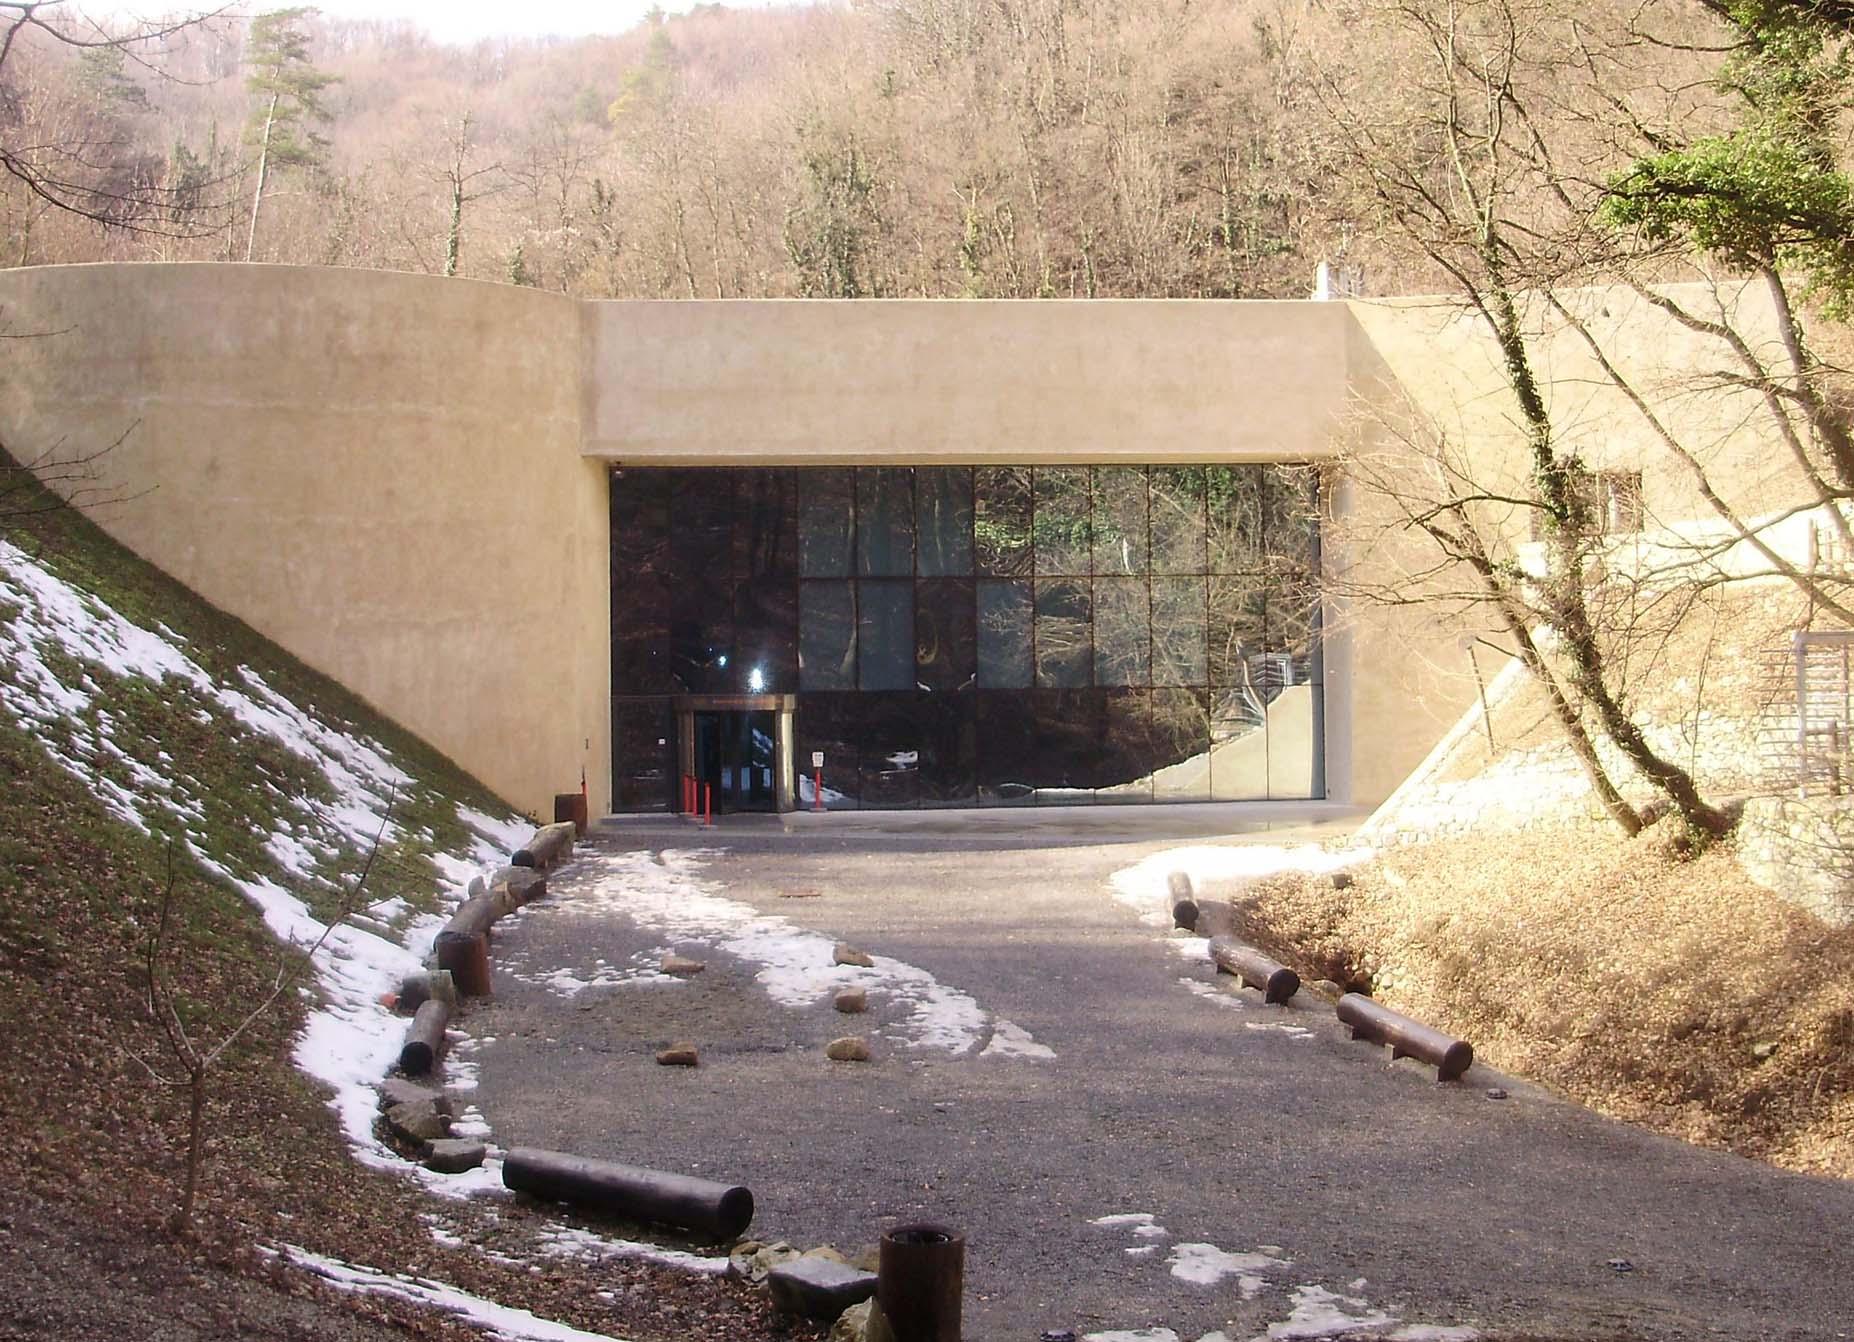 Muzej krapinskih neandertalaca. Autor: Robert Tabula.